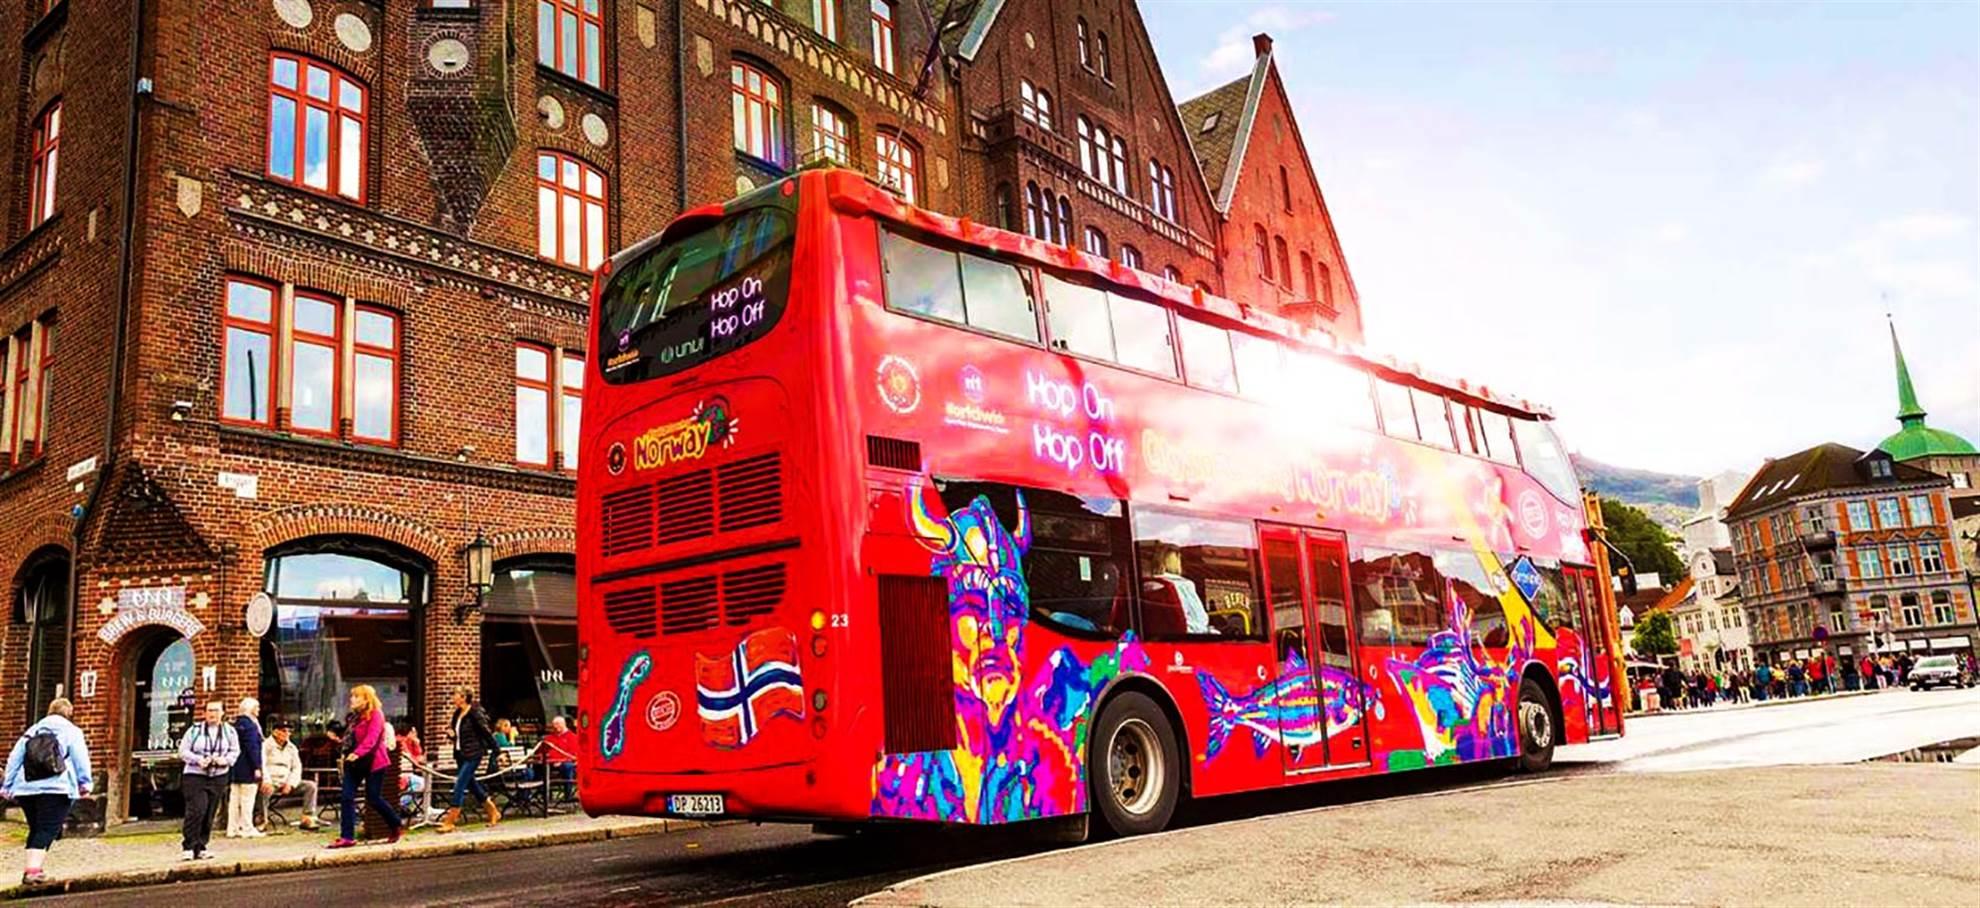 Bergen hop-on-hop-off bus